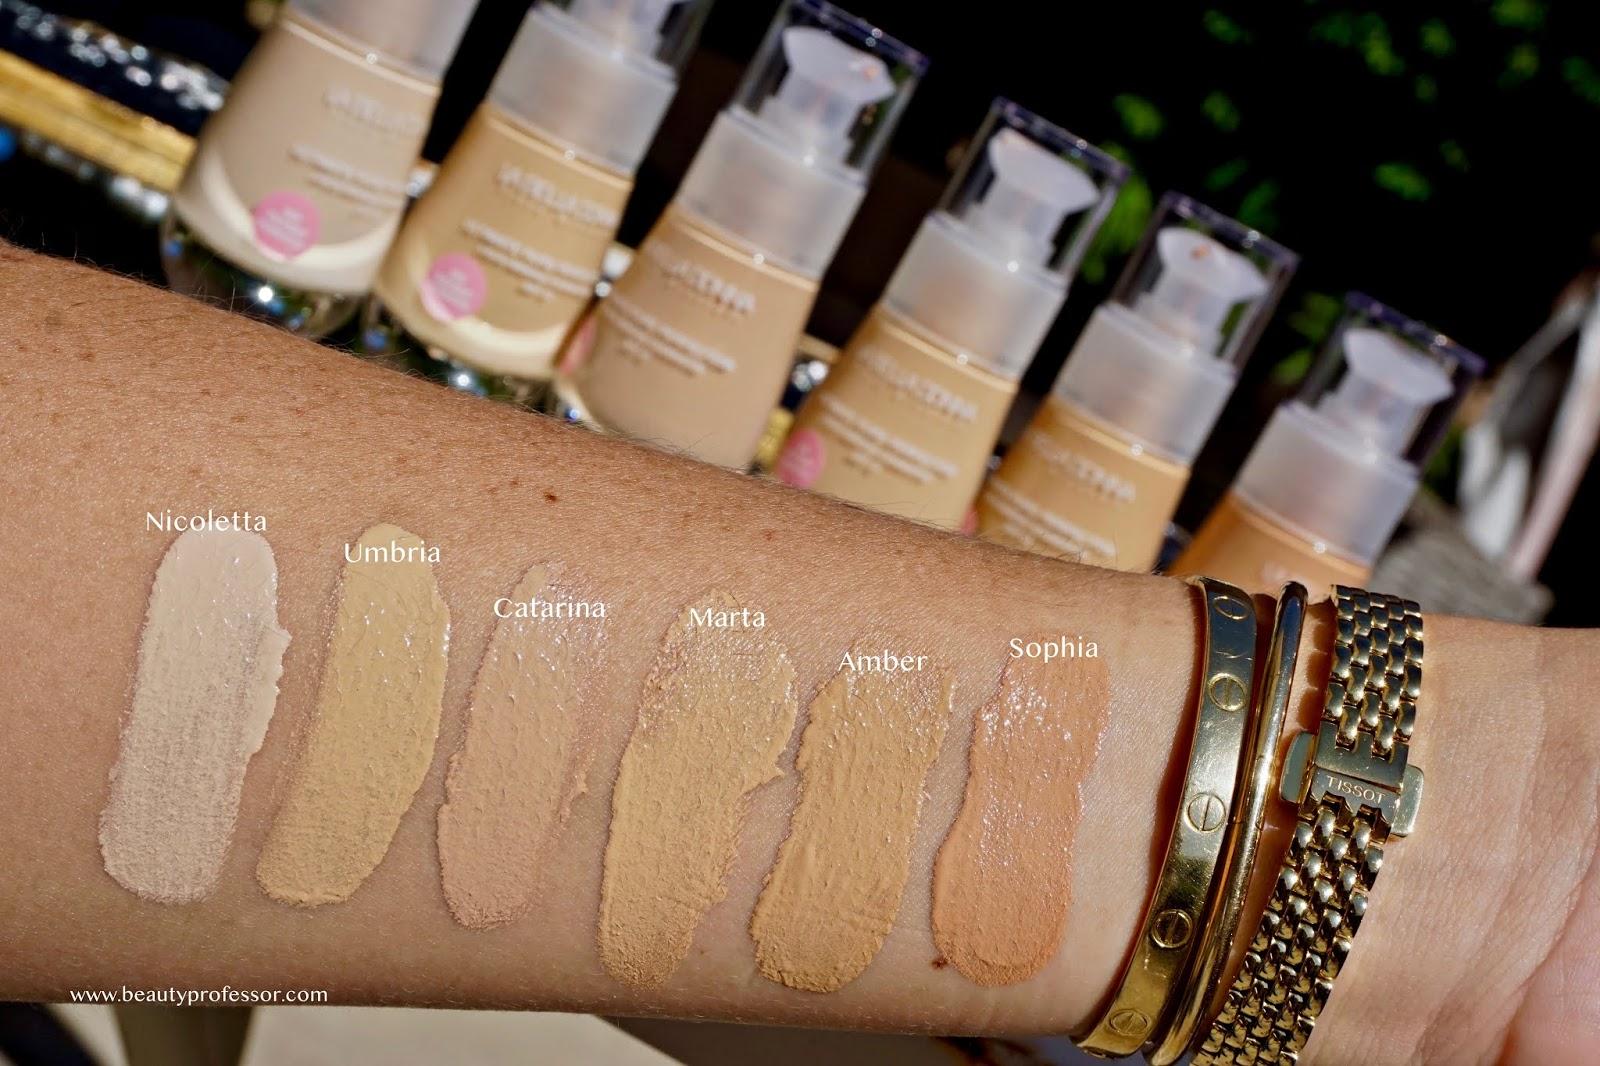 La Bella Donna New Ultimate Pure Perfection Liquid Treatment Foundation swatches